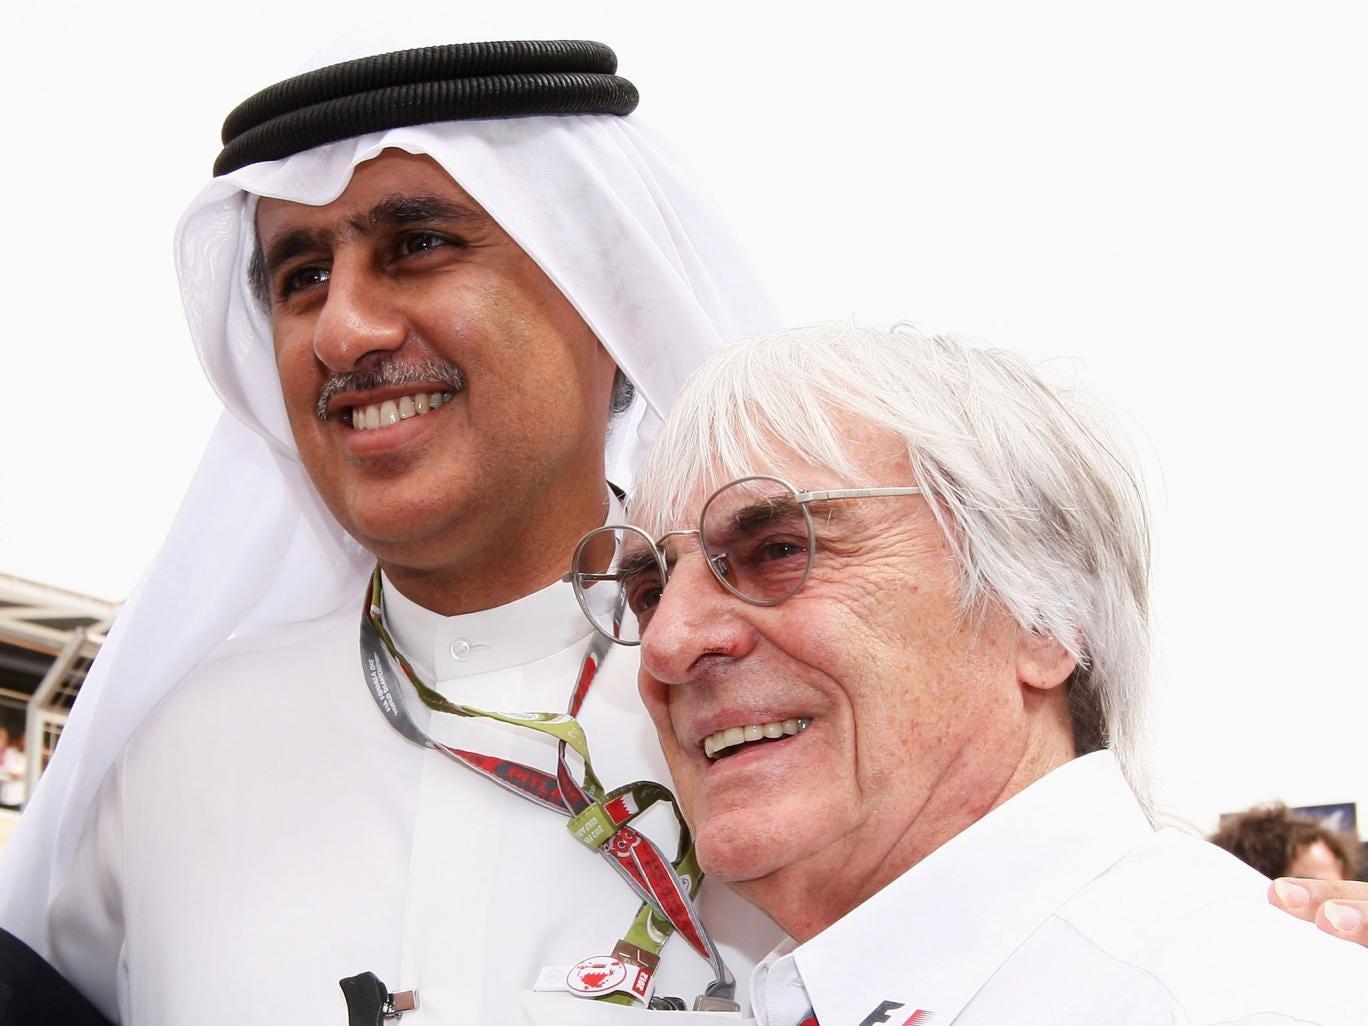 Zayed Rashed Al Zayani, Bahrain International Circuit chairman, has described protesters as 'terrorists'